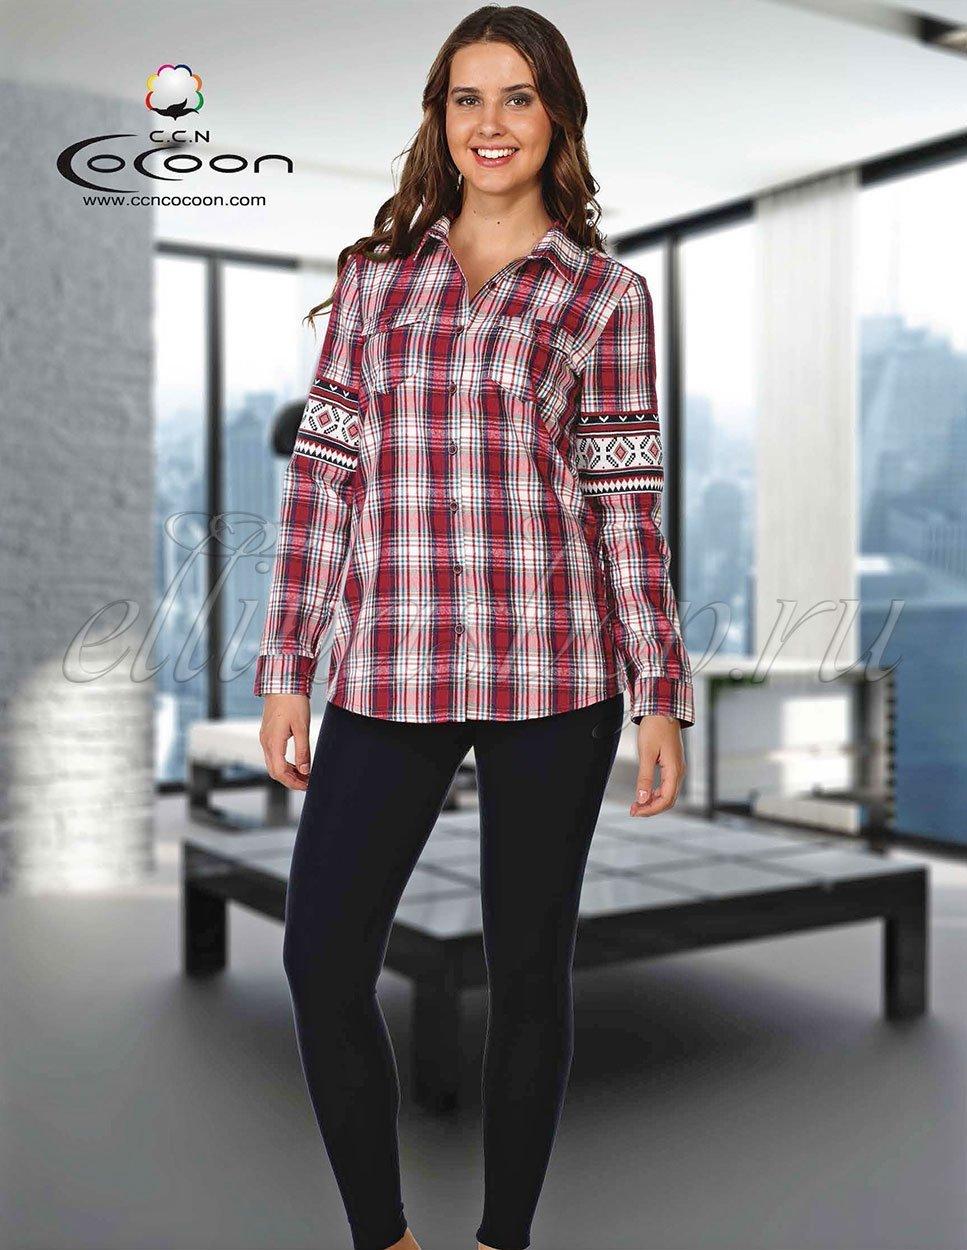 Комплект 96-1045 - 96-1046 Клетка (рубашка+лосины) Cocoon